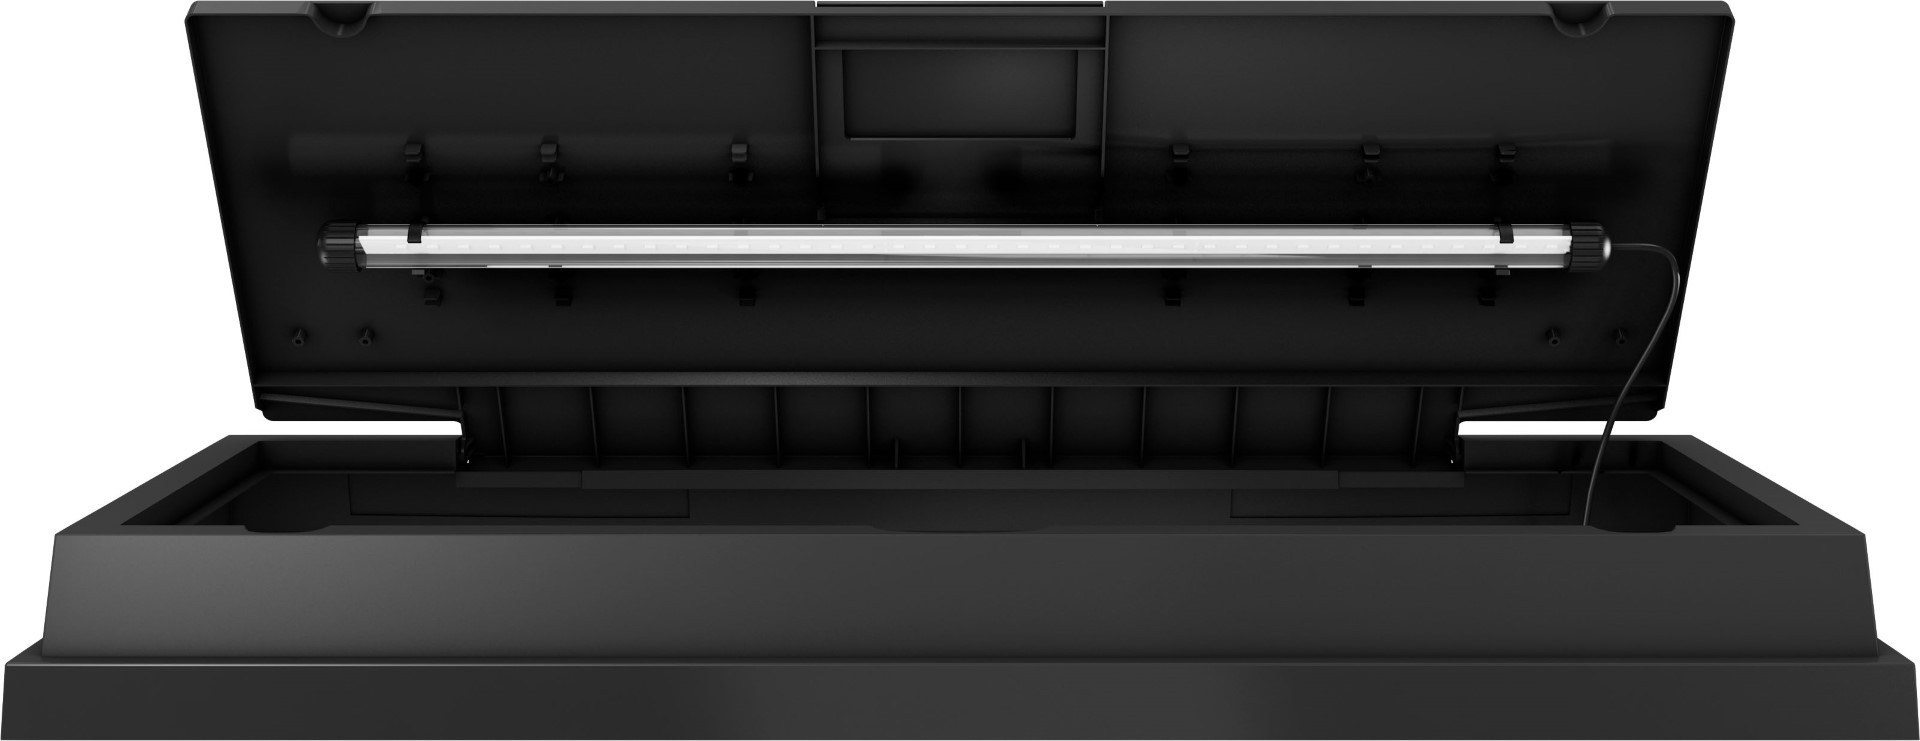 Juwel lichtkap PrimoLux 100x40 cm zwart met 1x23 Watt LED